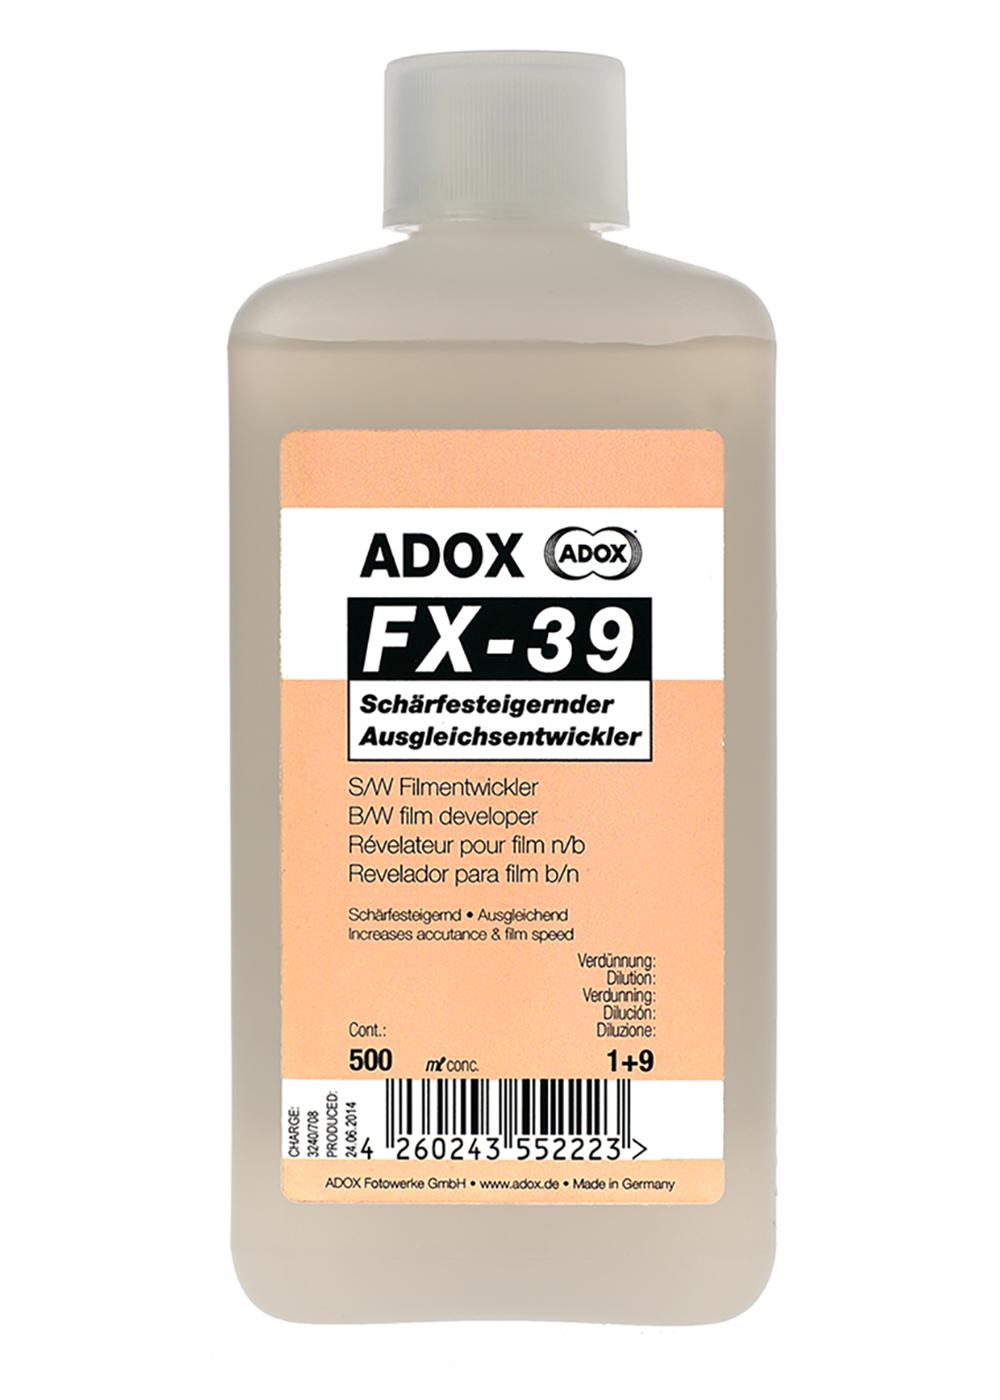 fx-39